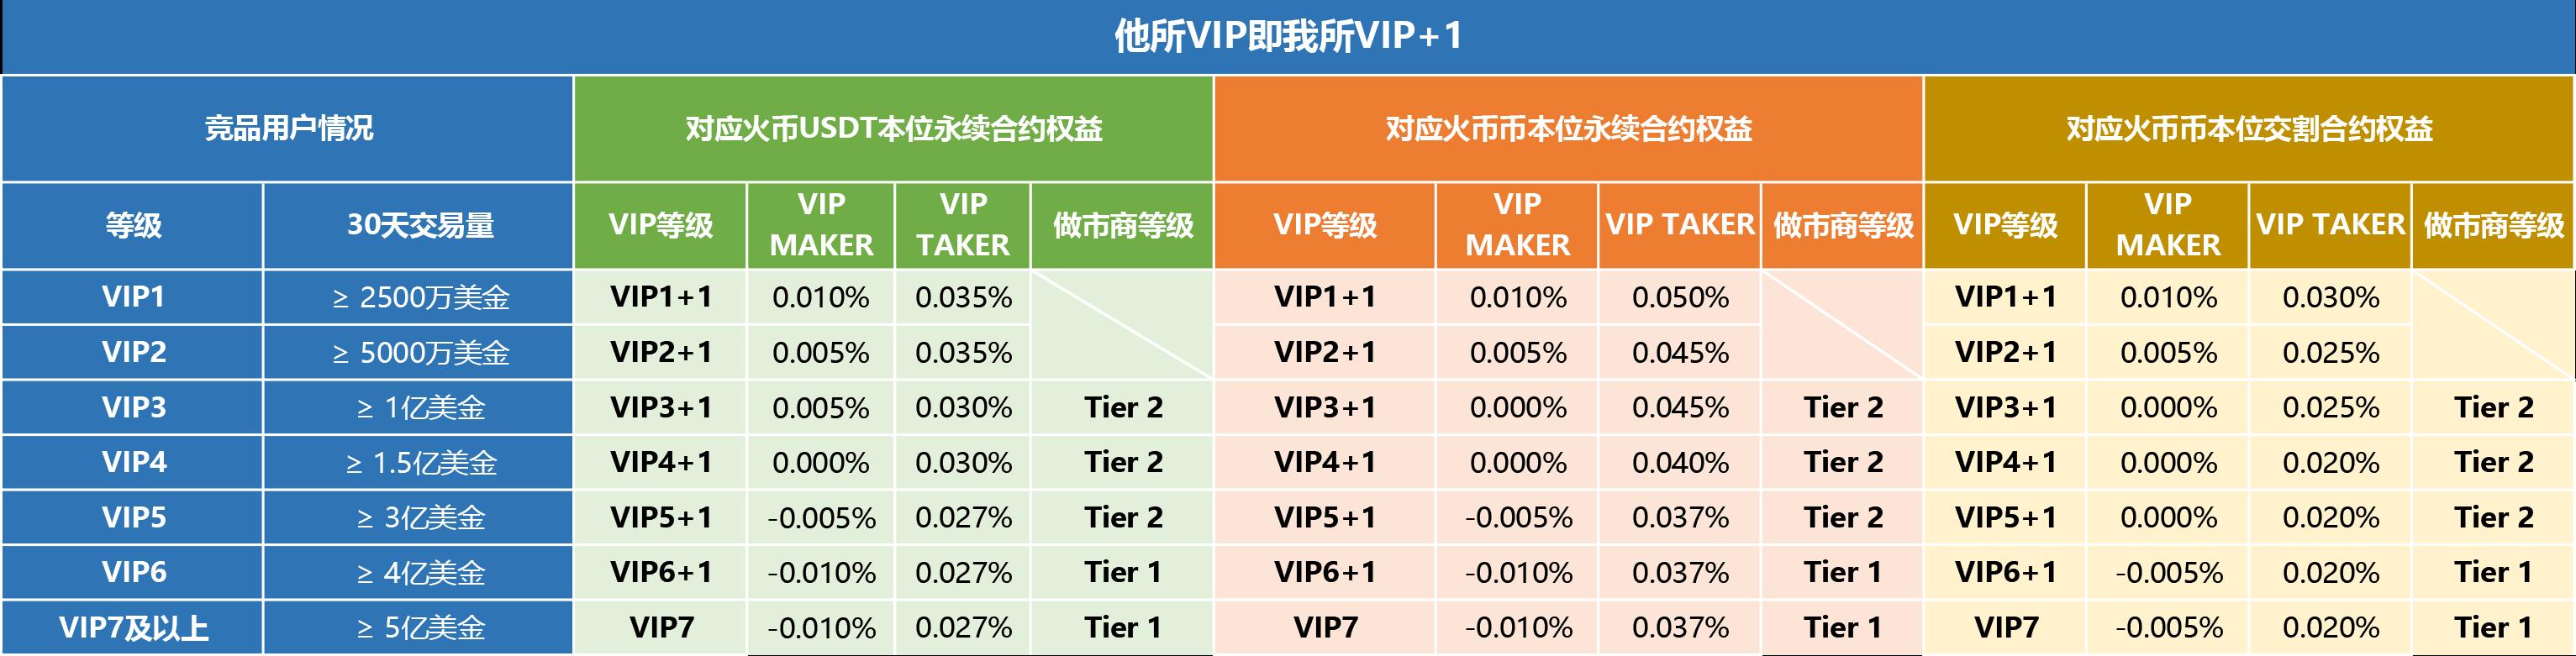 __VIP__VIP__.png